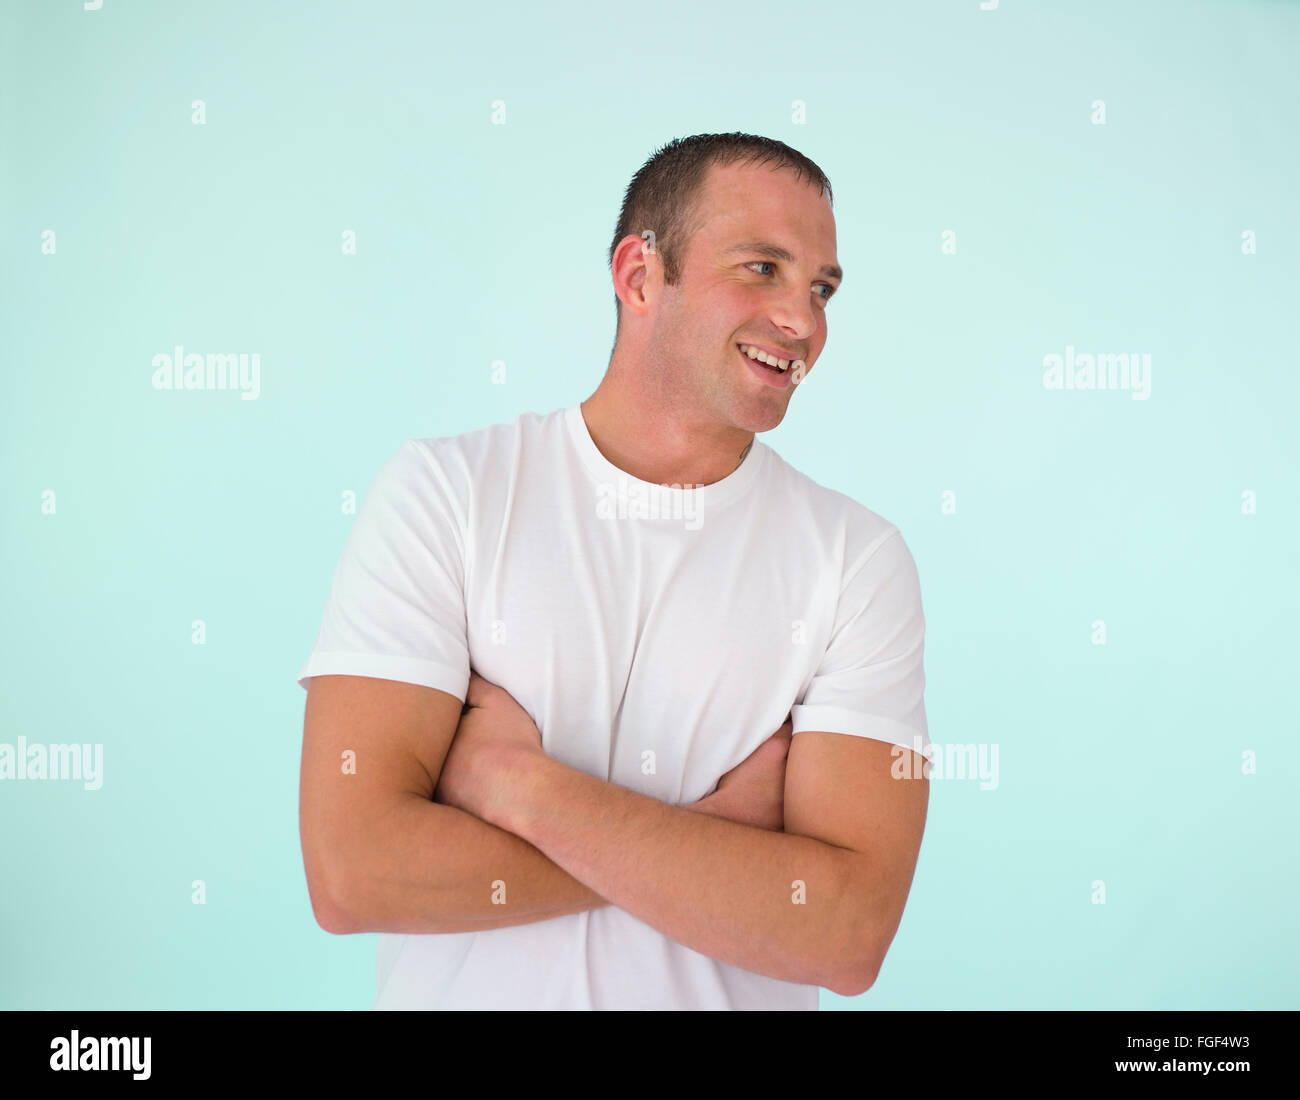 Mann mit verschränkten Armen, Lächeln Stockbild